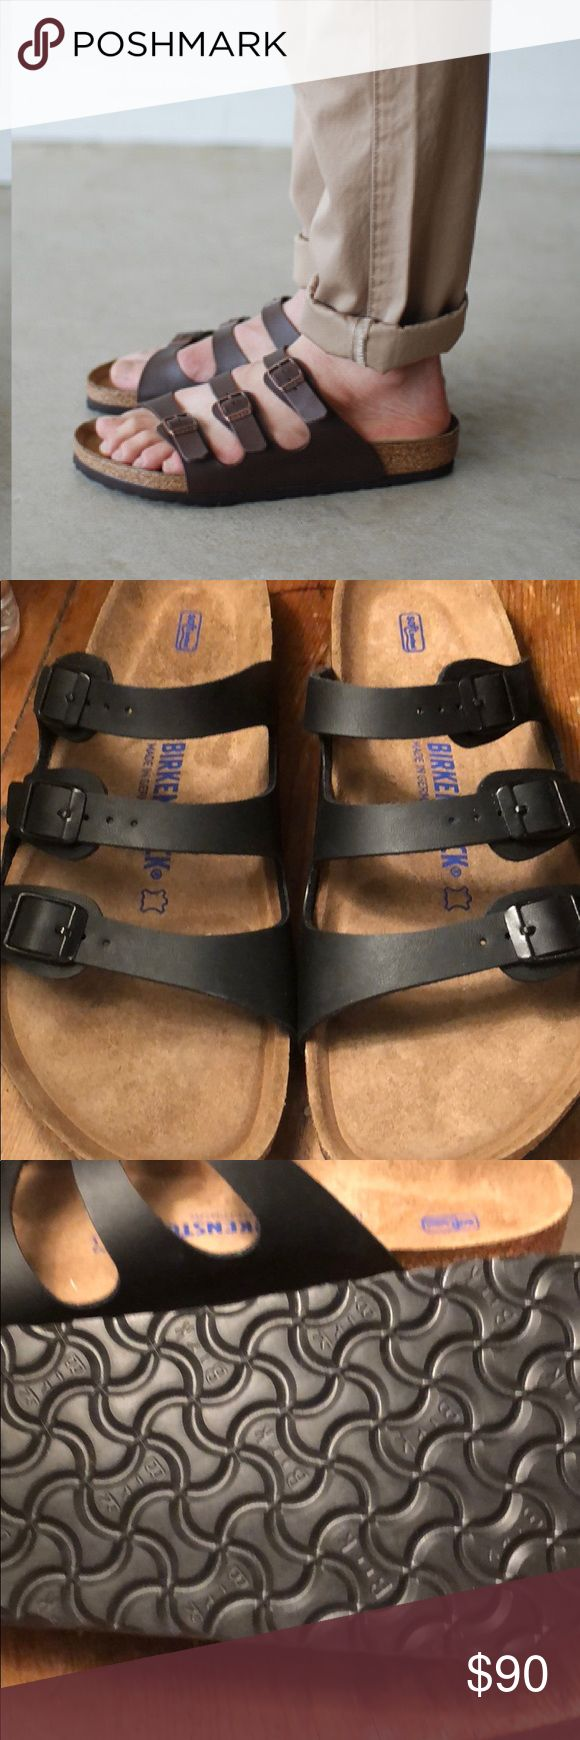 NEW BIRKENSTOCKS FLORIDA 42 Men's 9 Ladies 11 BIRKENSTOCKS FLORIDA 3 Strap 42 Men's 9 Ladies 11 NEW - NEVER WORN - NO BOX model is wearing brown - using pic to show fit.... mine are black. Birkenstock Shoes Sandals & Flip-Flops